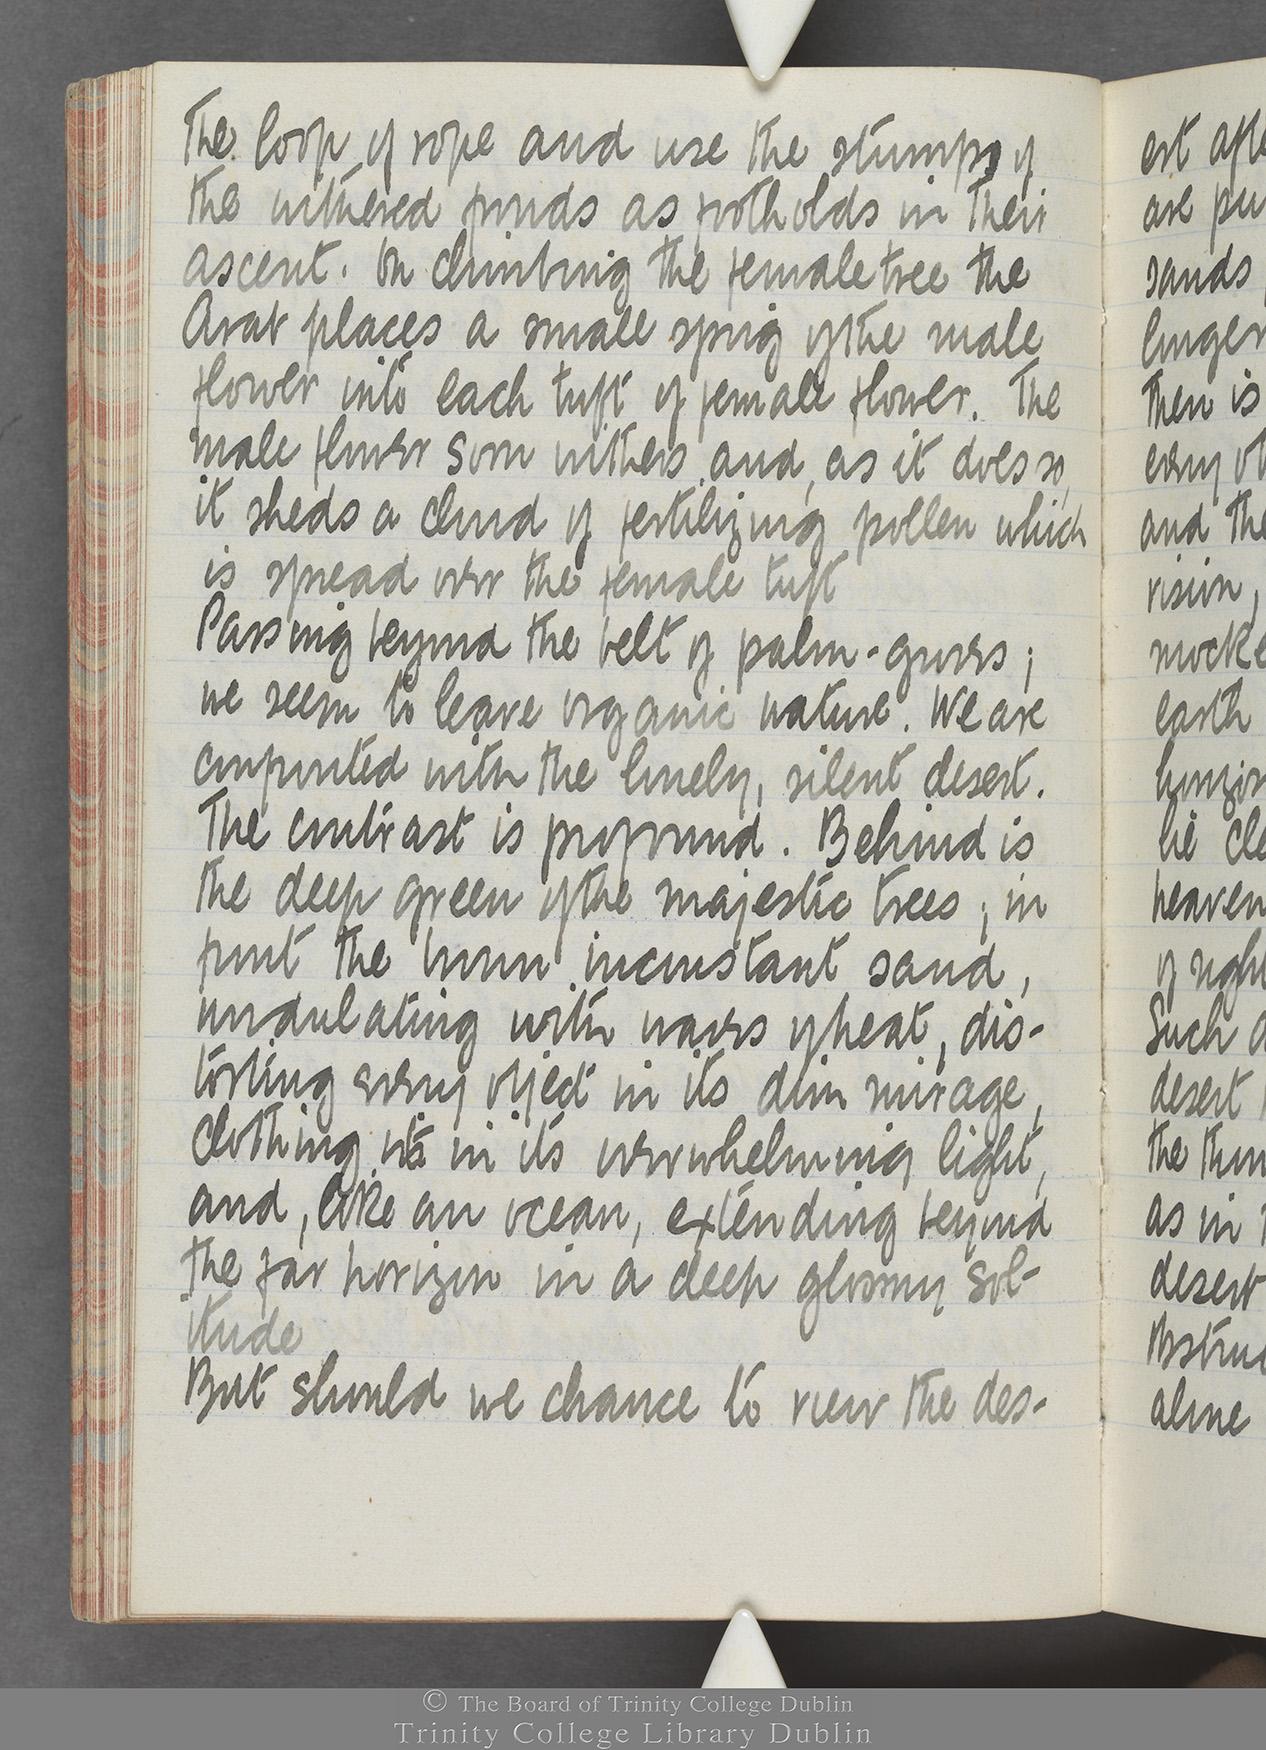 TCD MS 10515 folio 42v